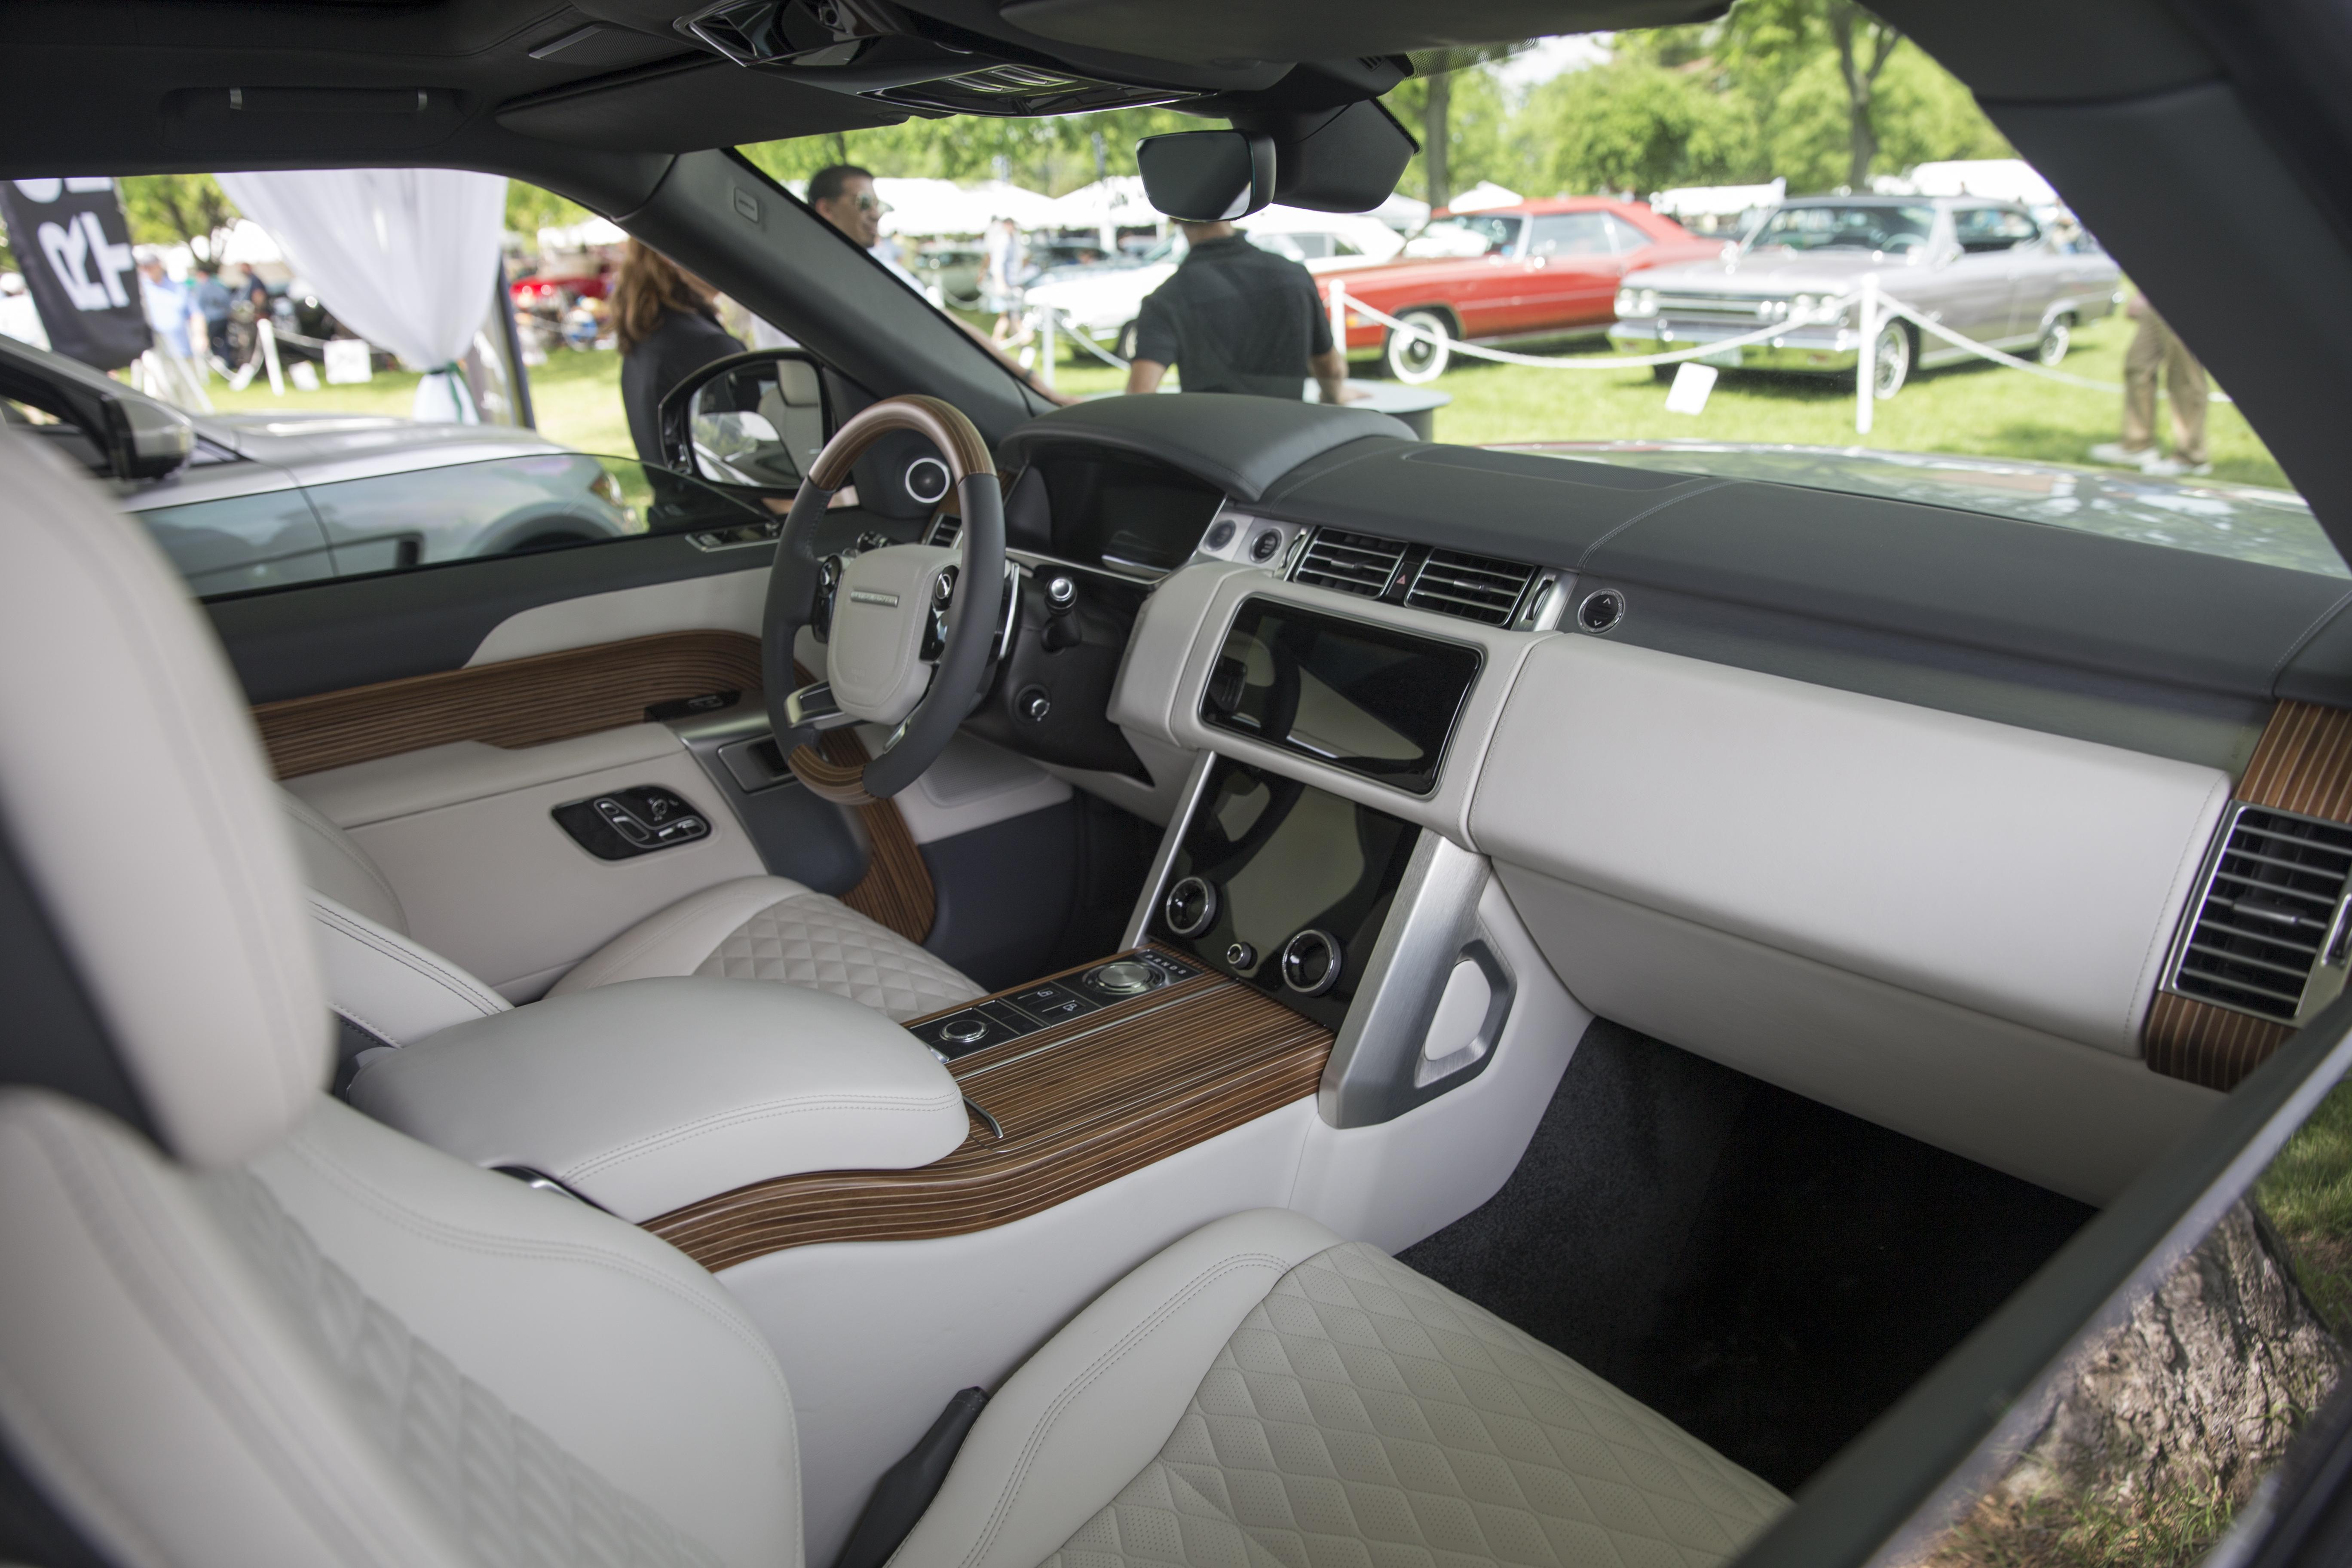 Range Rover 2019 >> File:2019 Range Rover SV Coupé, interior, Greenwich 2018